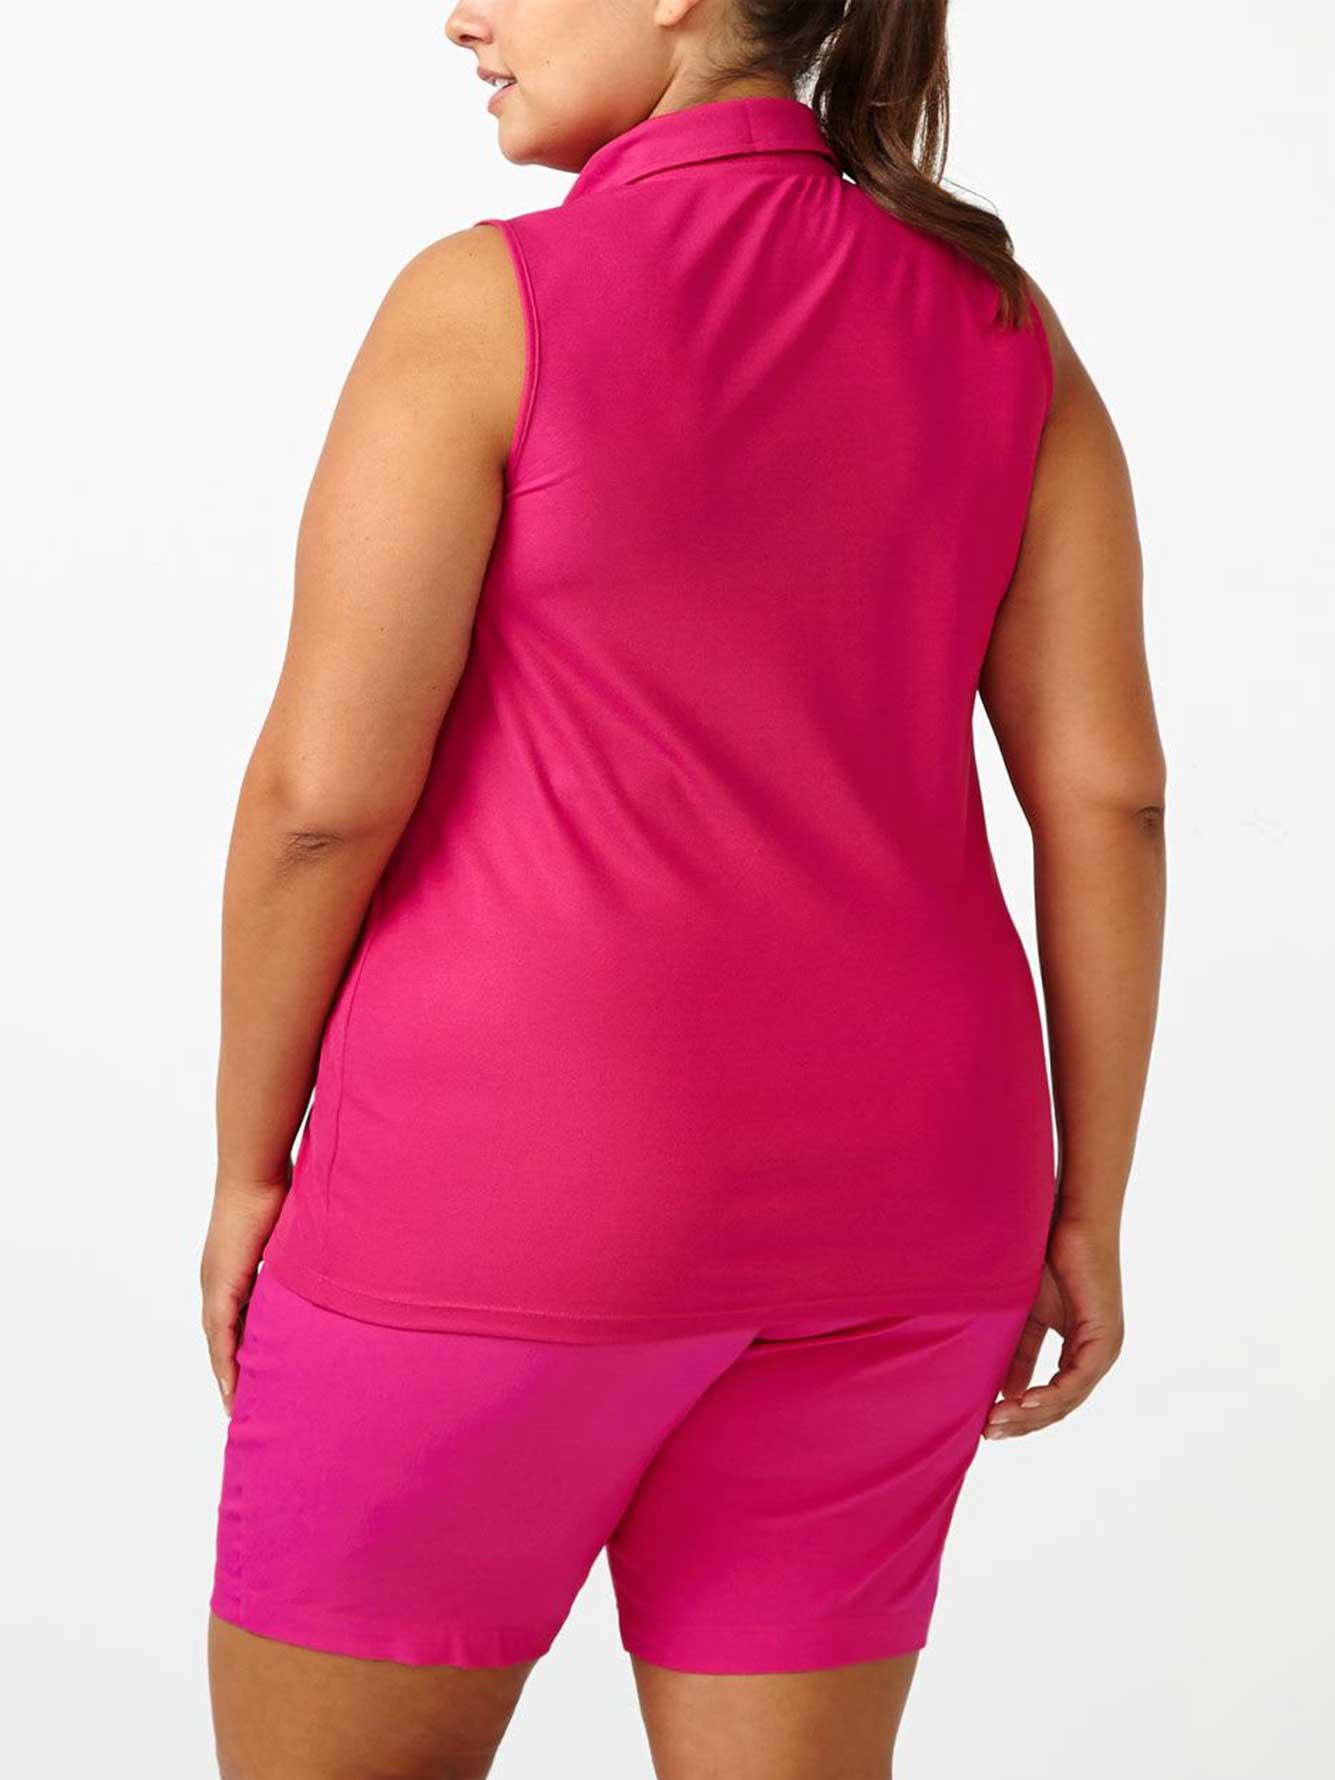 Sports plus size sleeveless golf top penningtons for Plus size sleeveless golf shirts